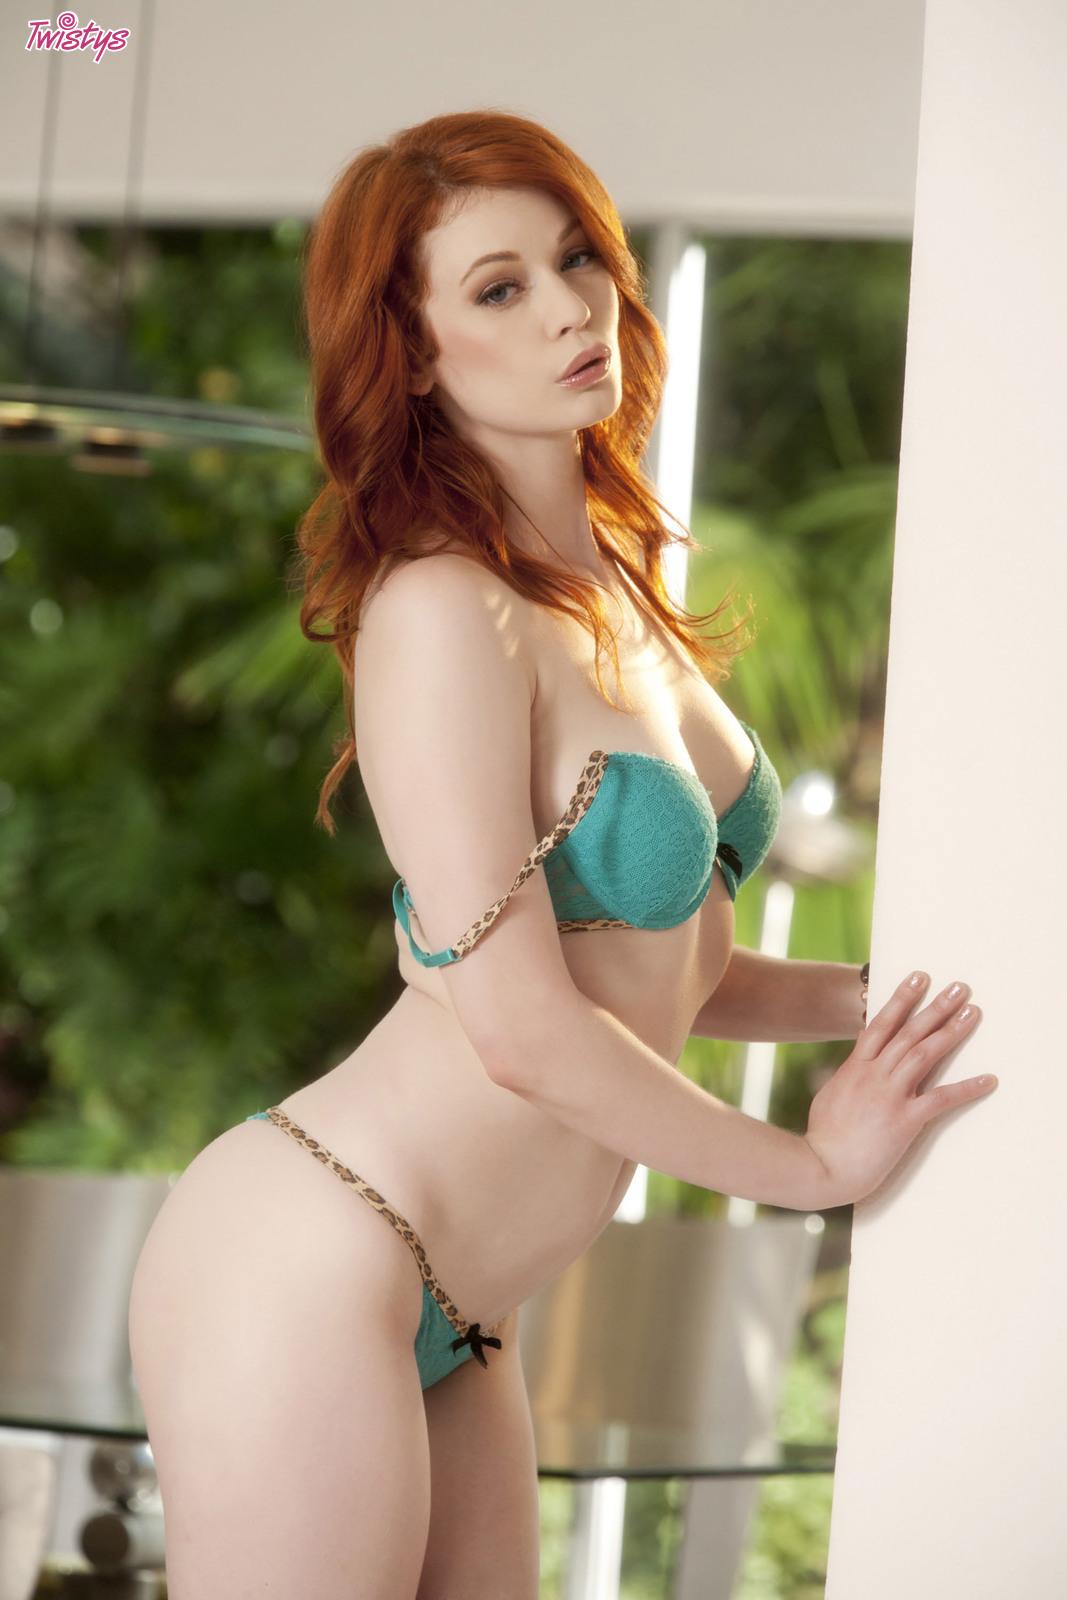 4206973_138627764962_baldcunt_erotiqlinks_greatass_JustineJoli_redhead_sexy.jpg